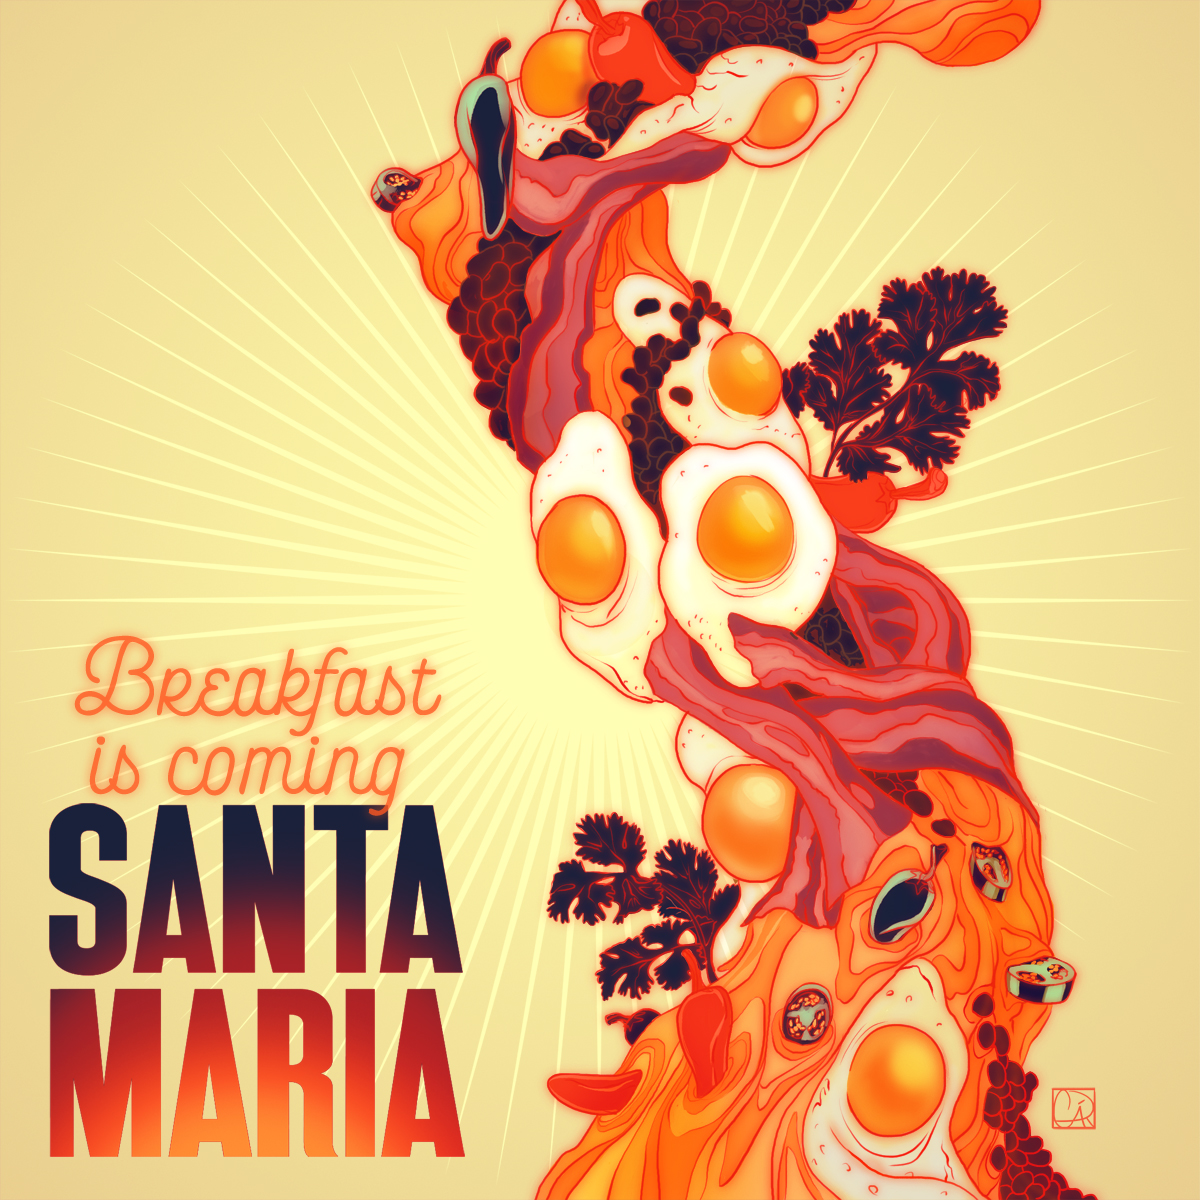 Santa Maria Breakfast Art 1.jpg